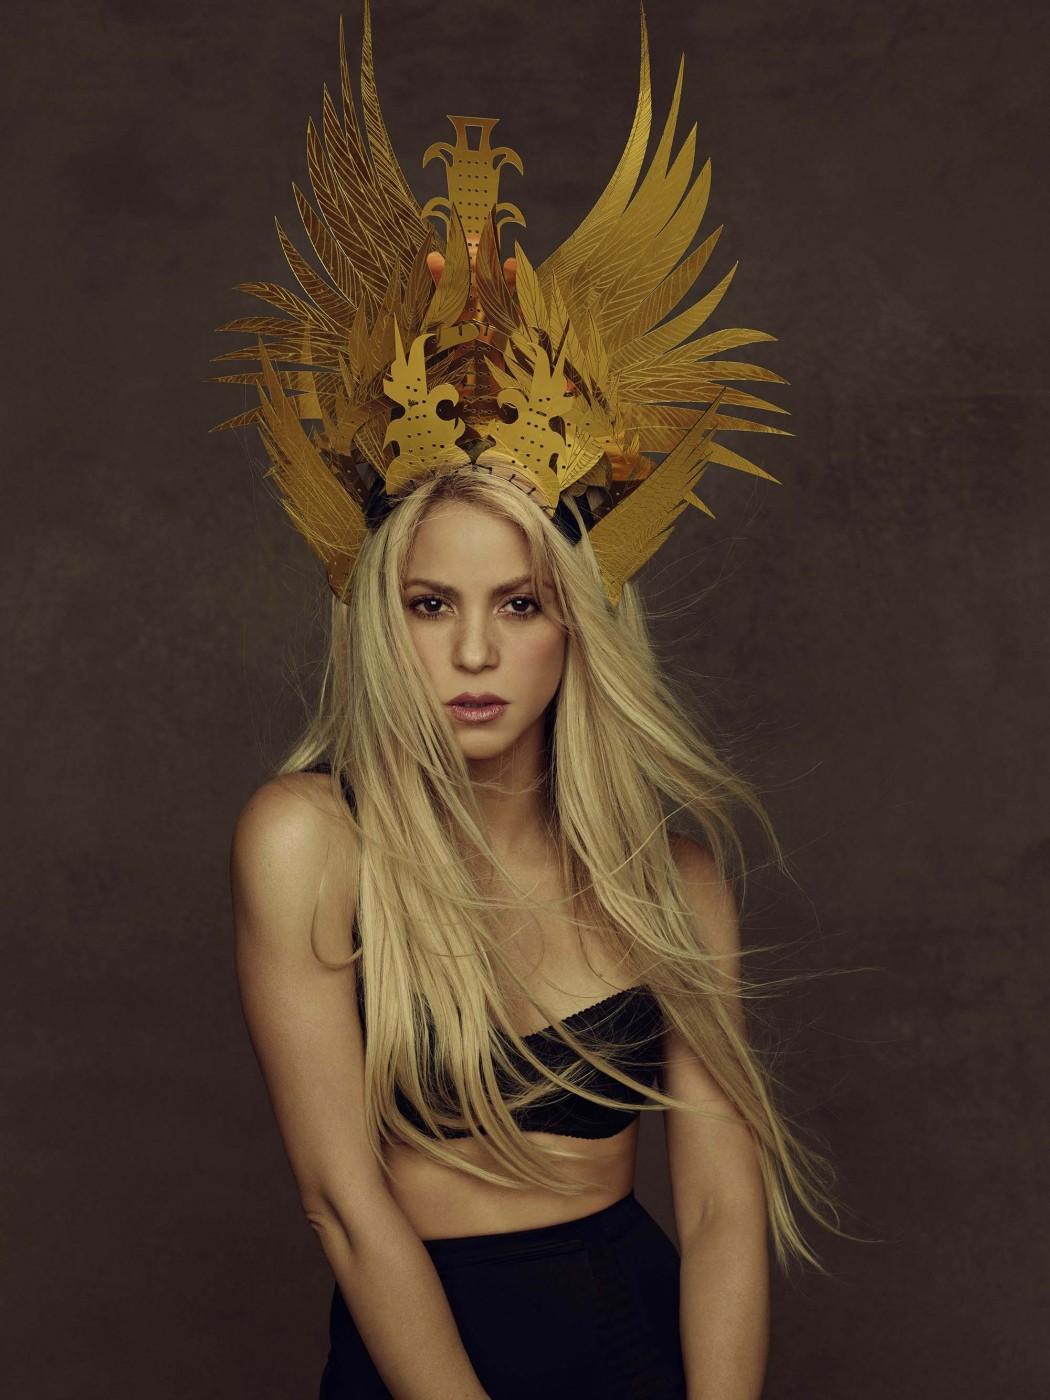 Shakira Mebarak photogallery: photos, pics. Photo #120587 ($) |Shakira Laundry Service Photoshoot